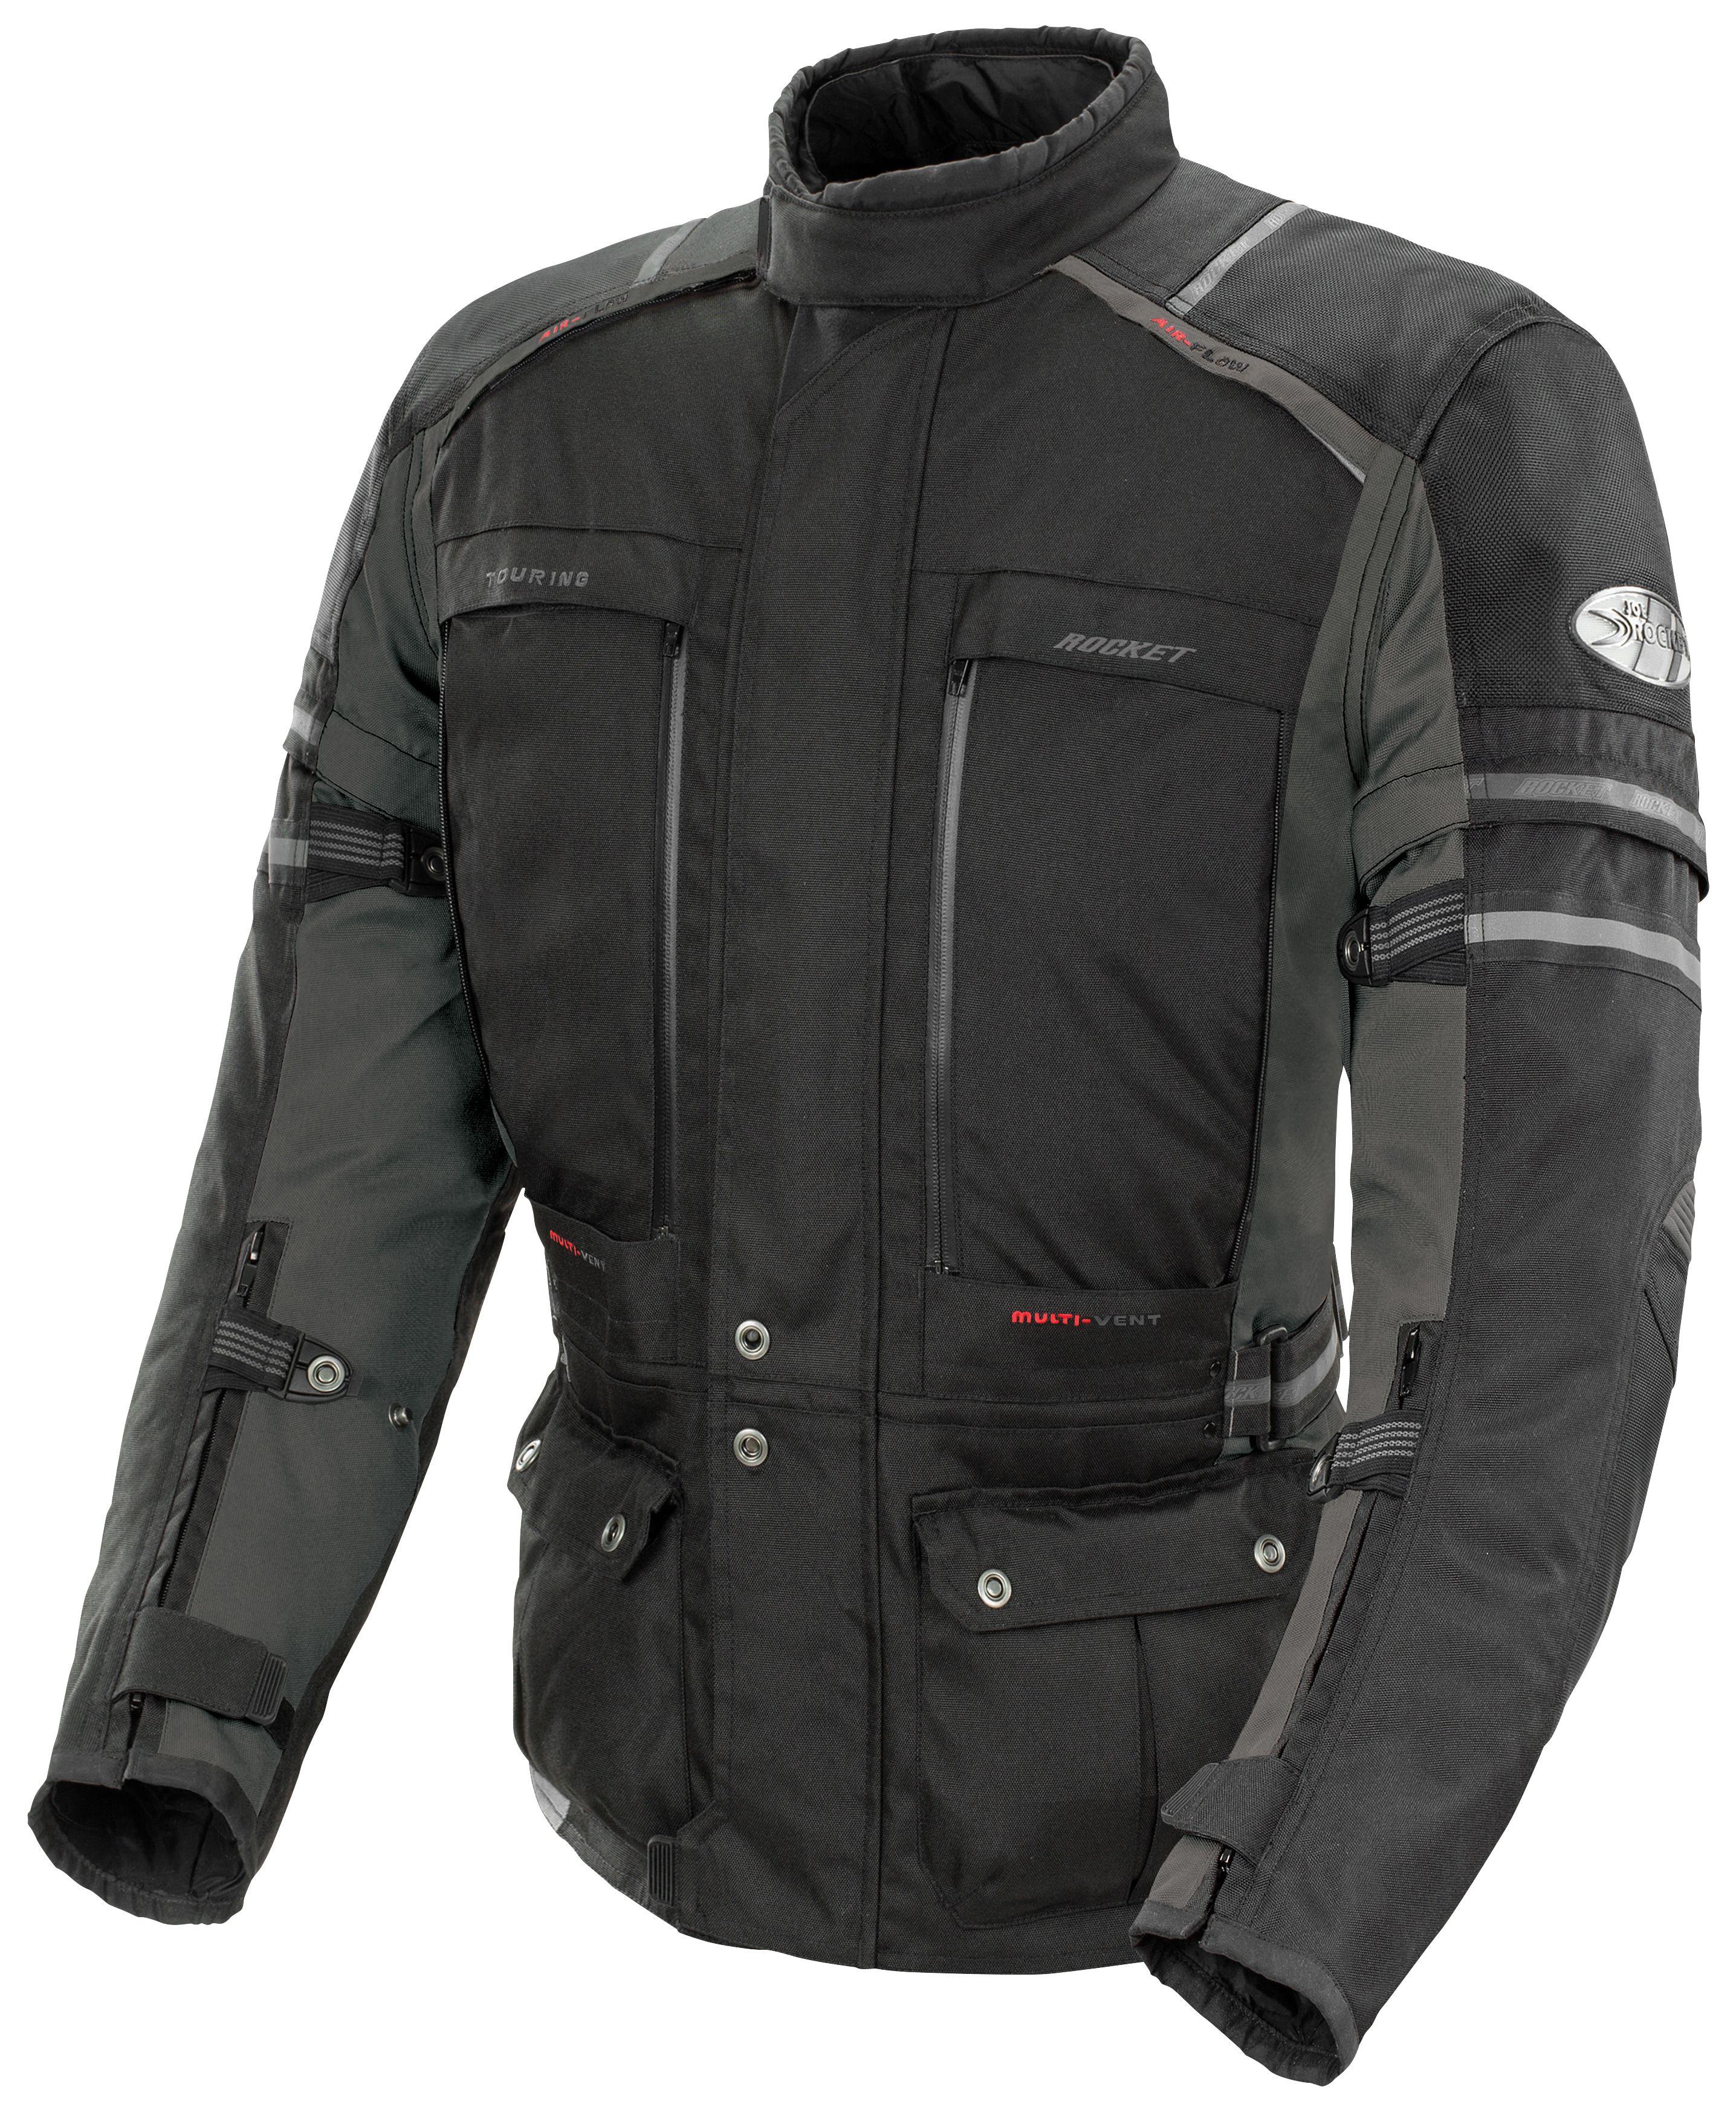 Joe Rocket Ballistic Adventure Jacket 10 30 00 Off